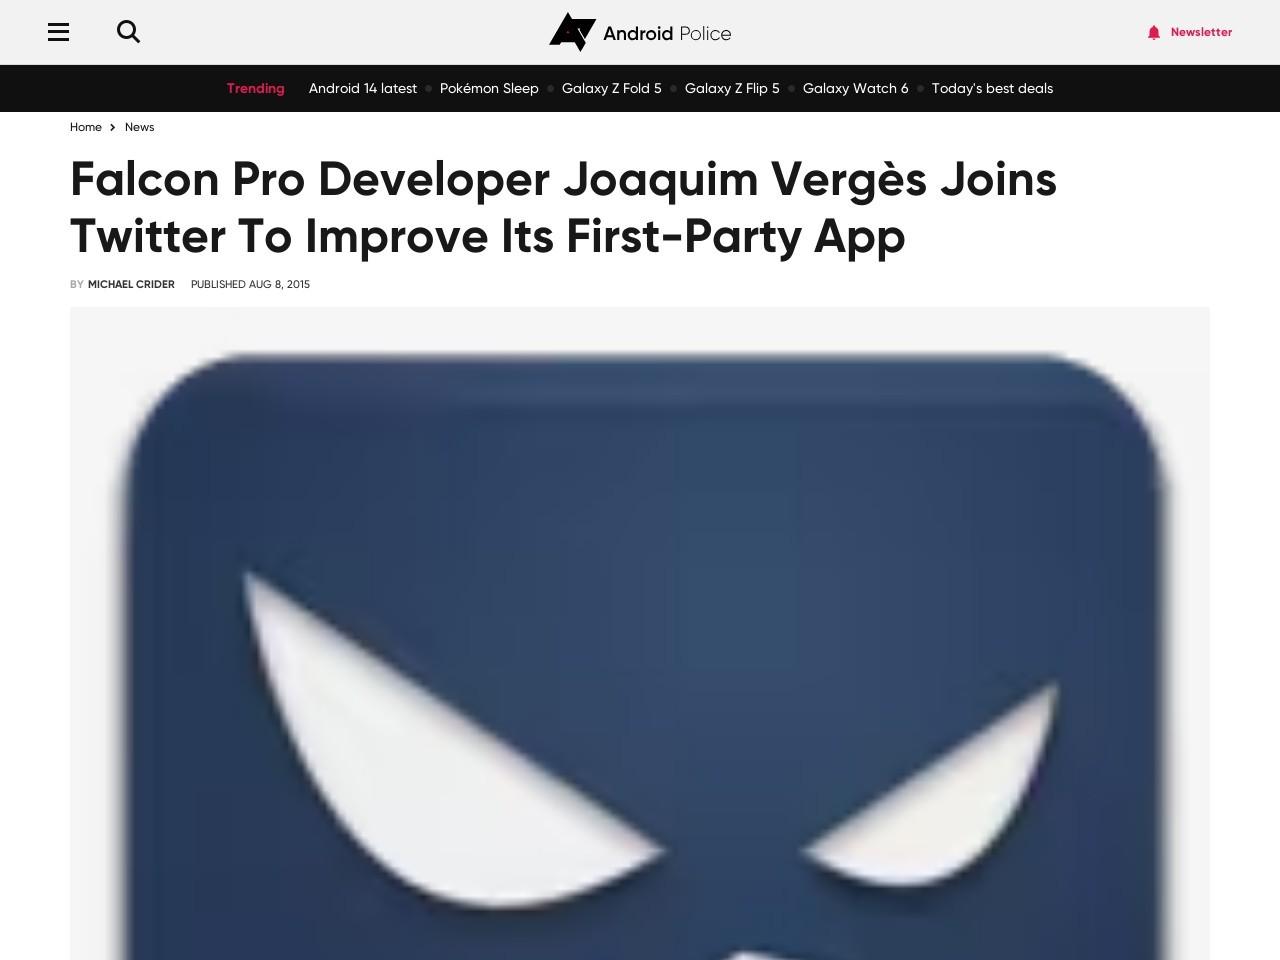 Falcon Pro Developer Joaquim Vergès Joins Twitter To …